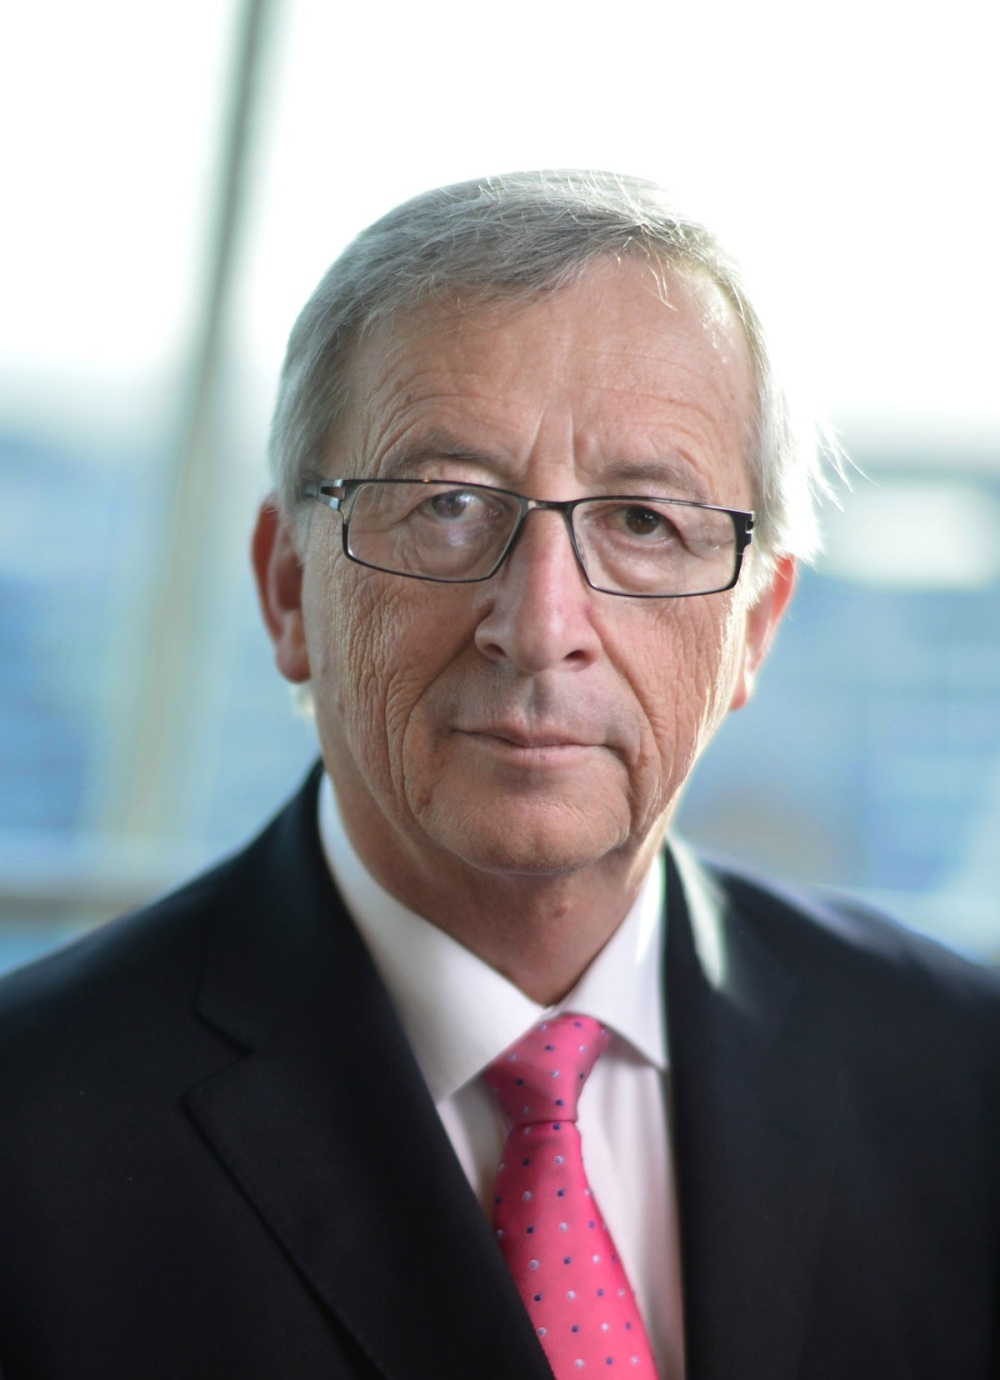 Claudius_Juncker_die_7_Martis_2014